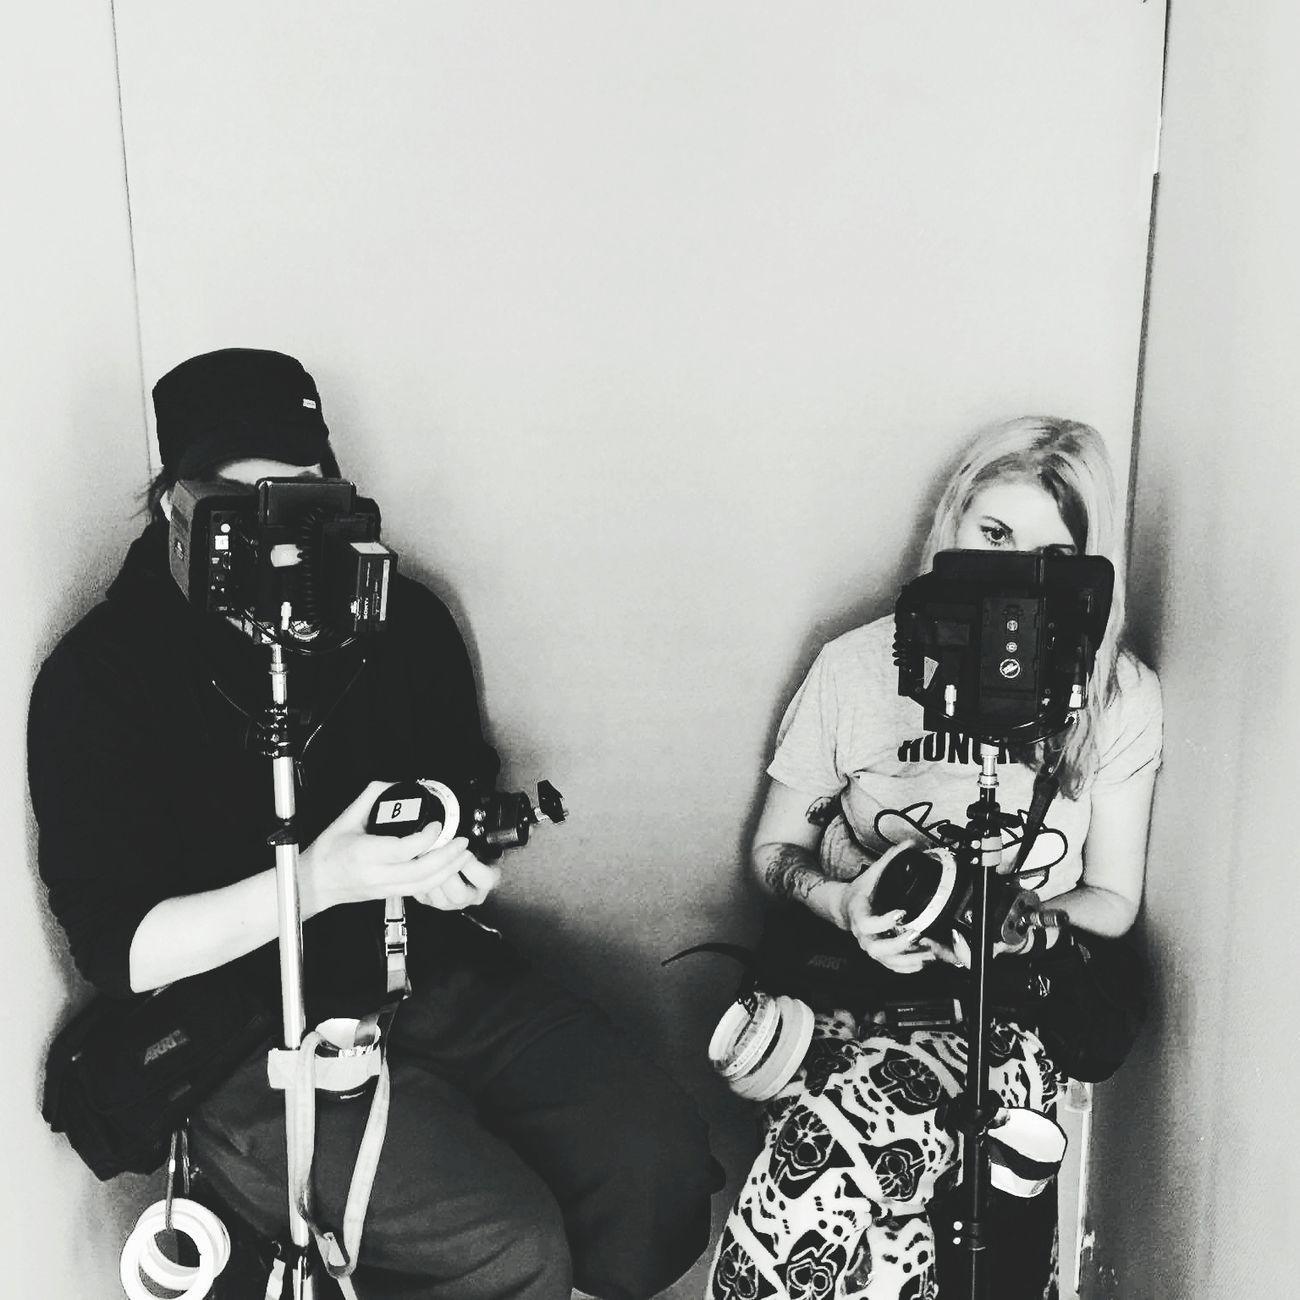 On set today. Arri Belt Film Sweden I Love My Job! Filmset Life On Set Setlife ARRI Film Location Focus Puller Love ARRI Tv-series 1-AC Arri Mini Boxx Boxx Atom Wcu 3 K35 Lense Arri Amira Arri Bag